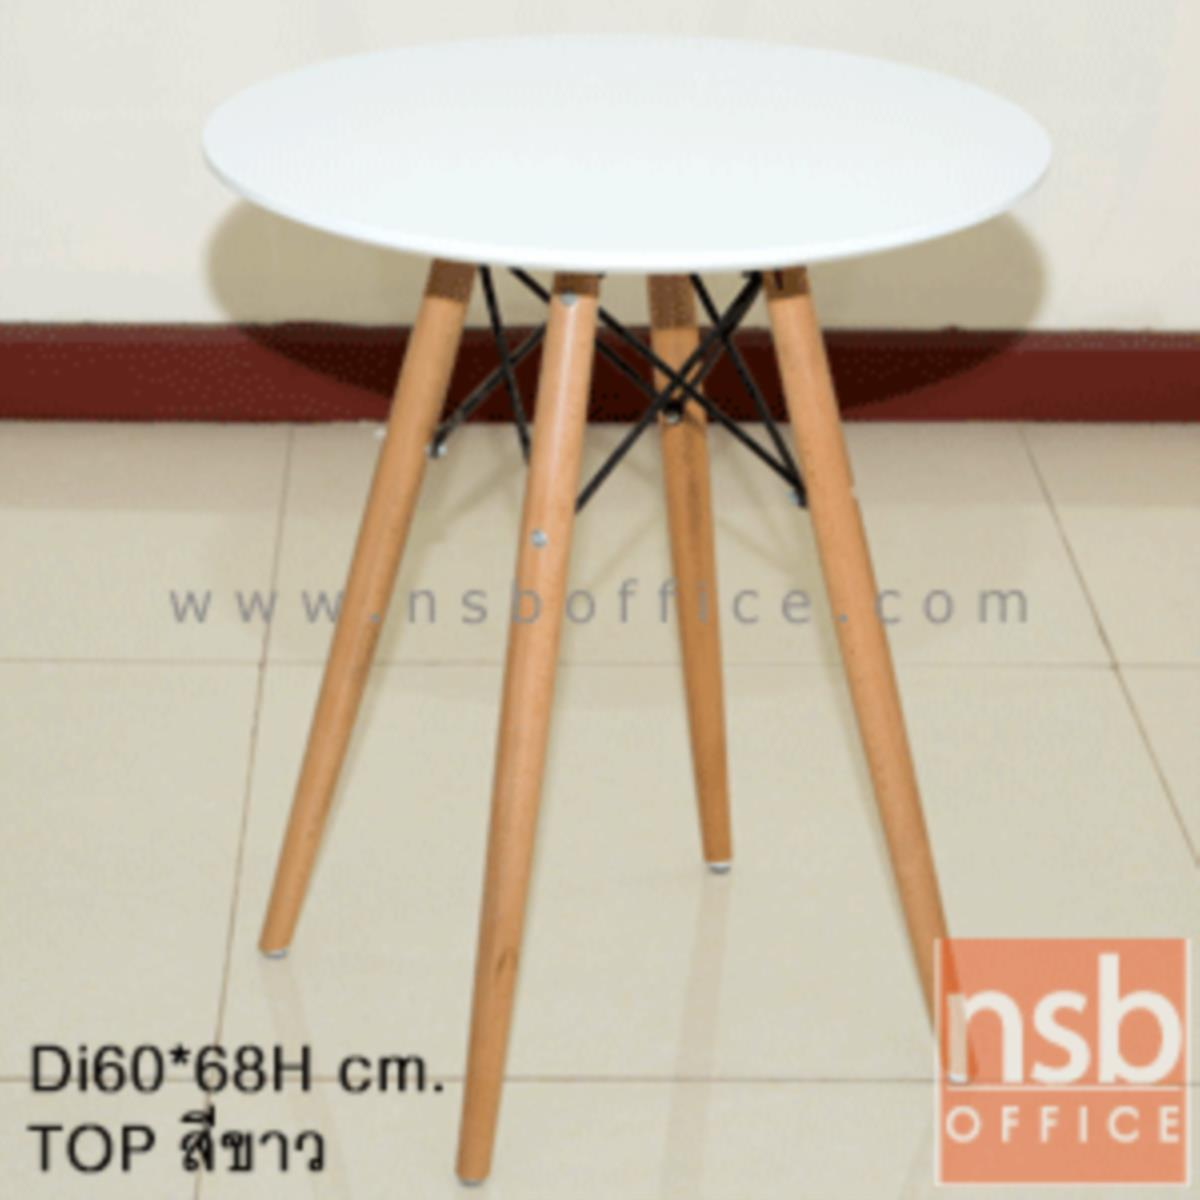 A09A100:โต๊ะหน้าไม้ MDF รุ่น Channing (แชนนิง) ขนาด 60Di cm.  เหล็กเส้นพ่นดำ ขาไม้สีบีช